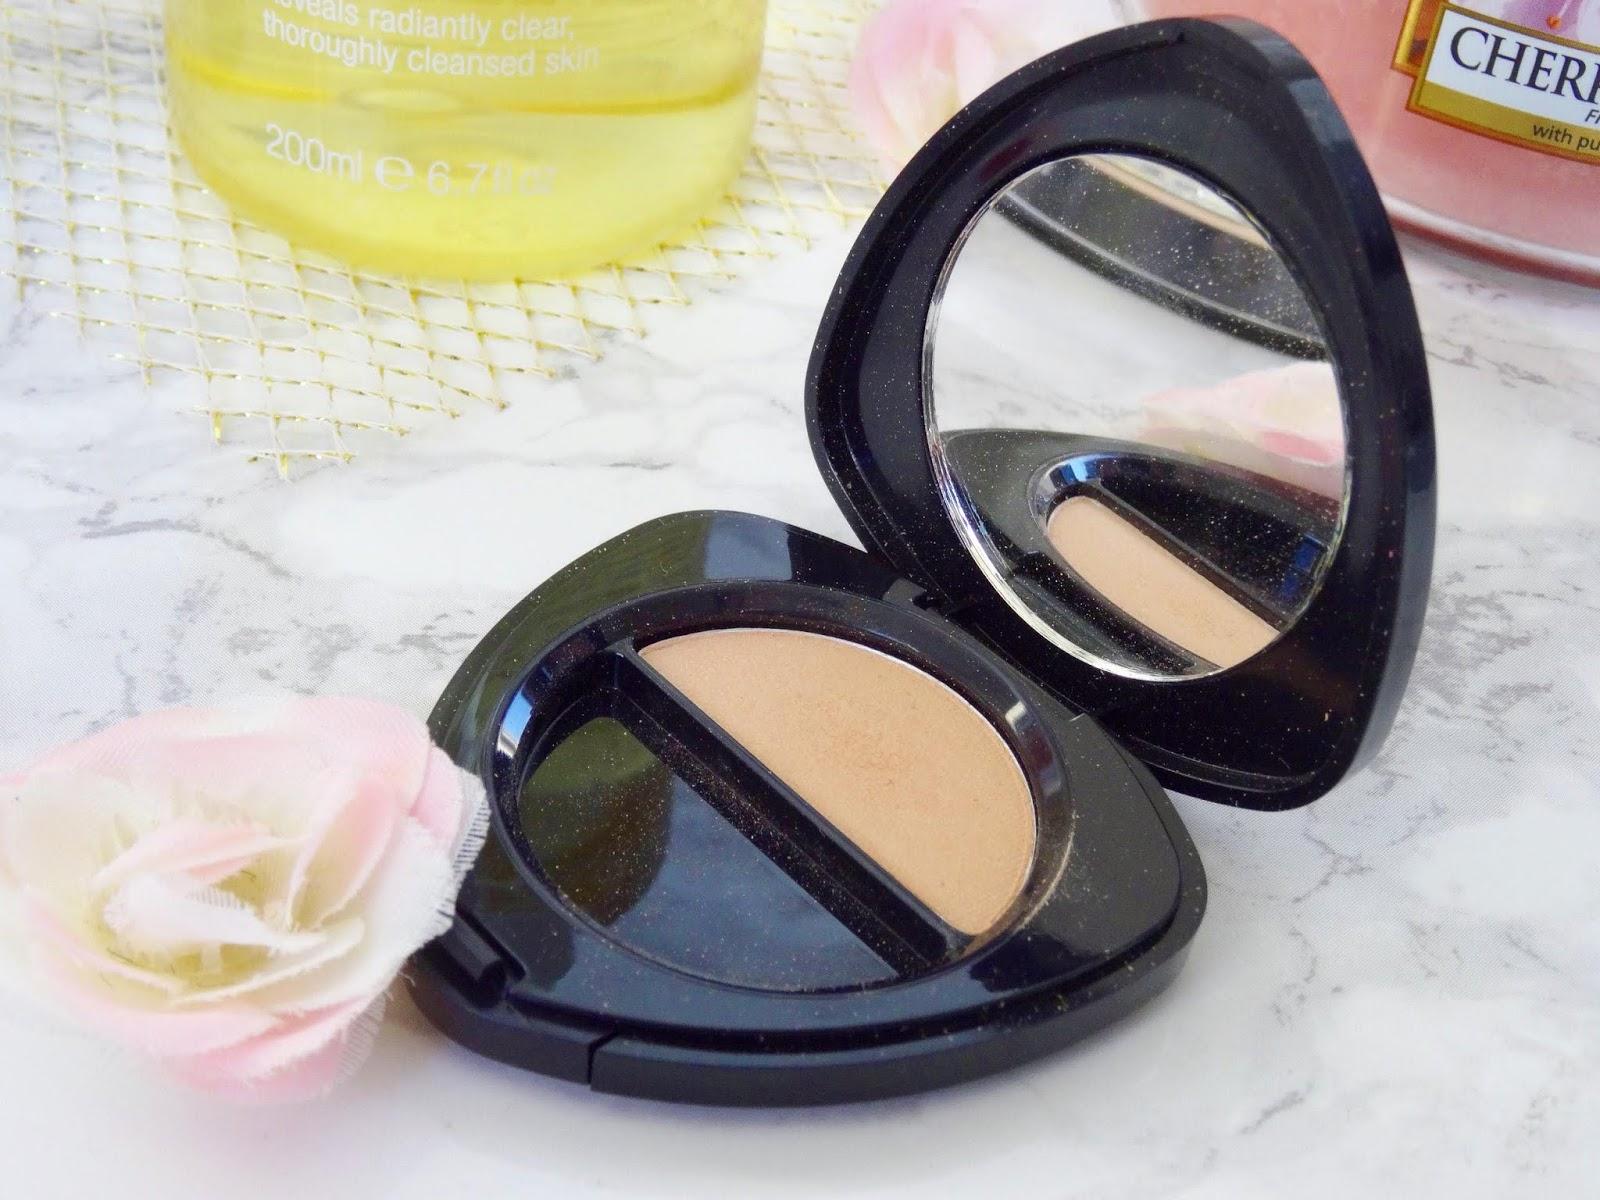 Dr Hauschka Single Eyeshadow in 01 Alabaster